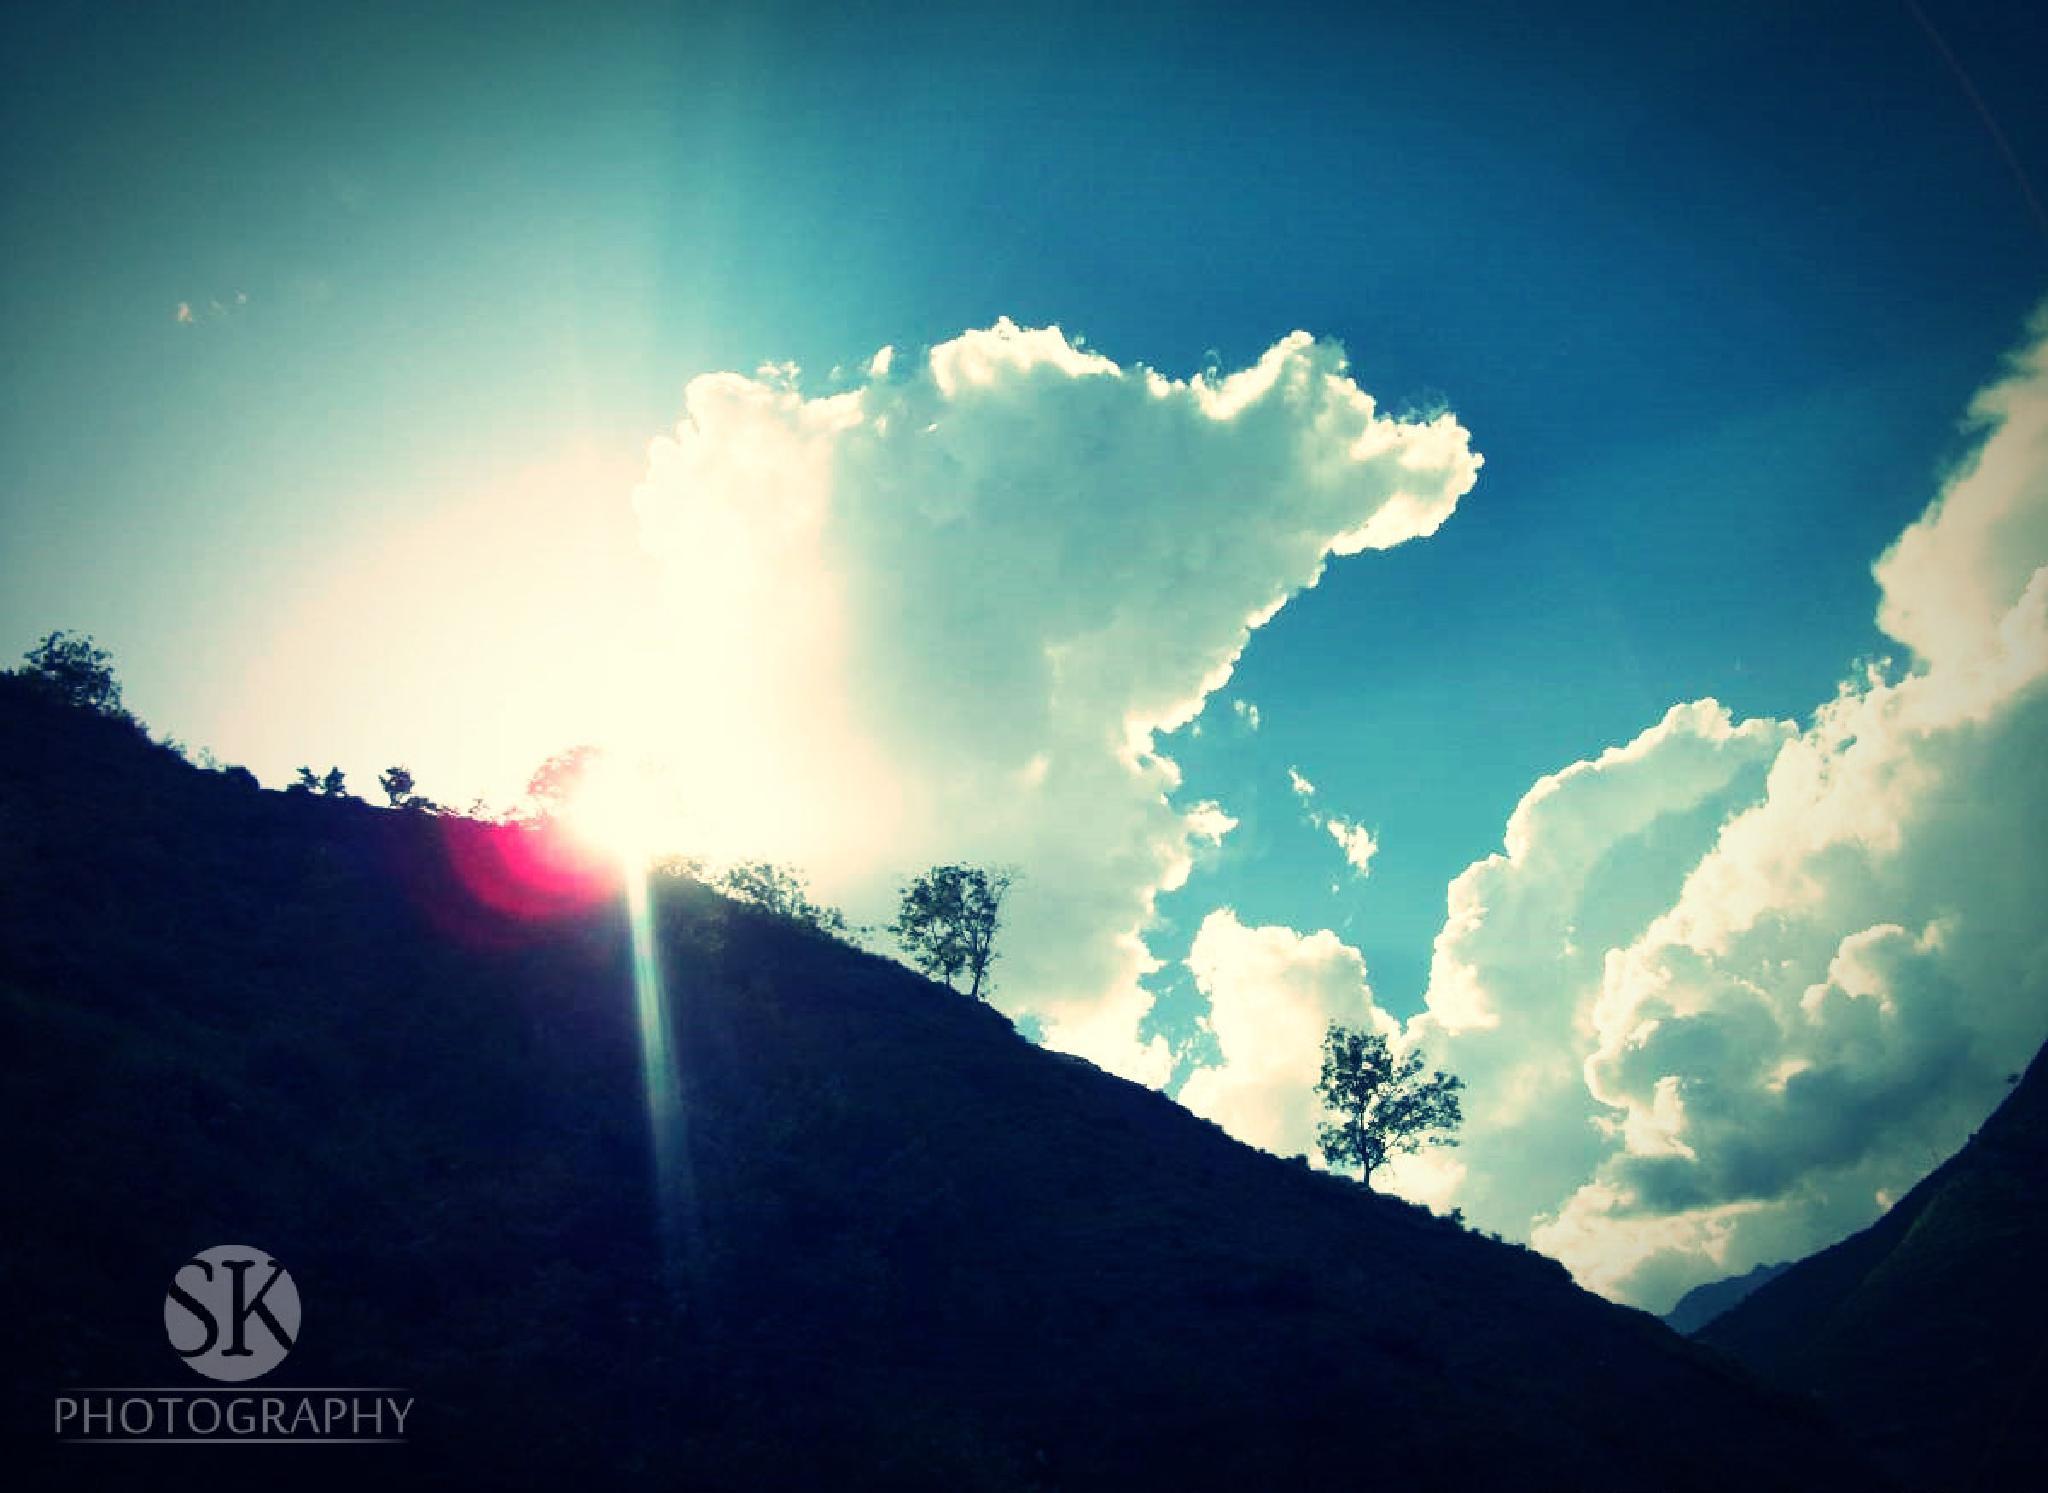 Untitled by Sohail Khan